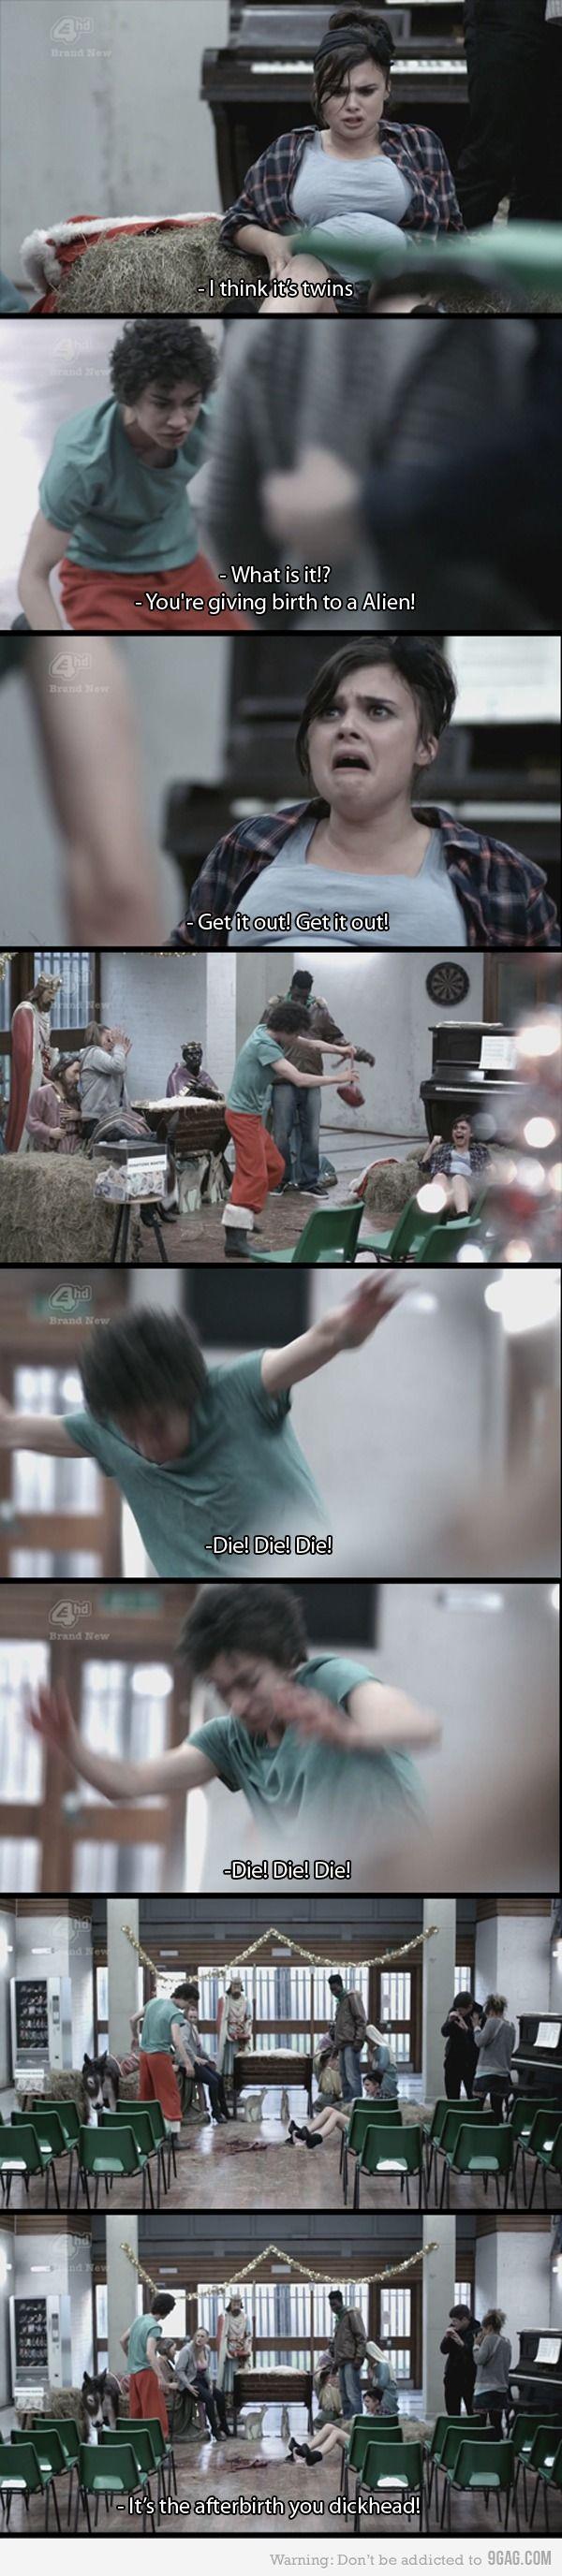 Oh this scene made me laugh soooo hard!